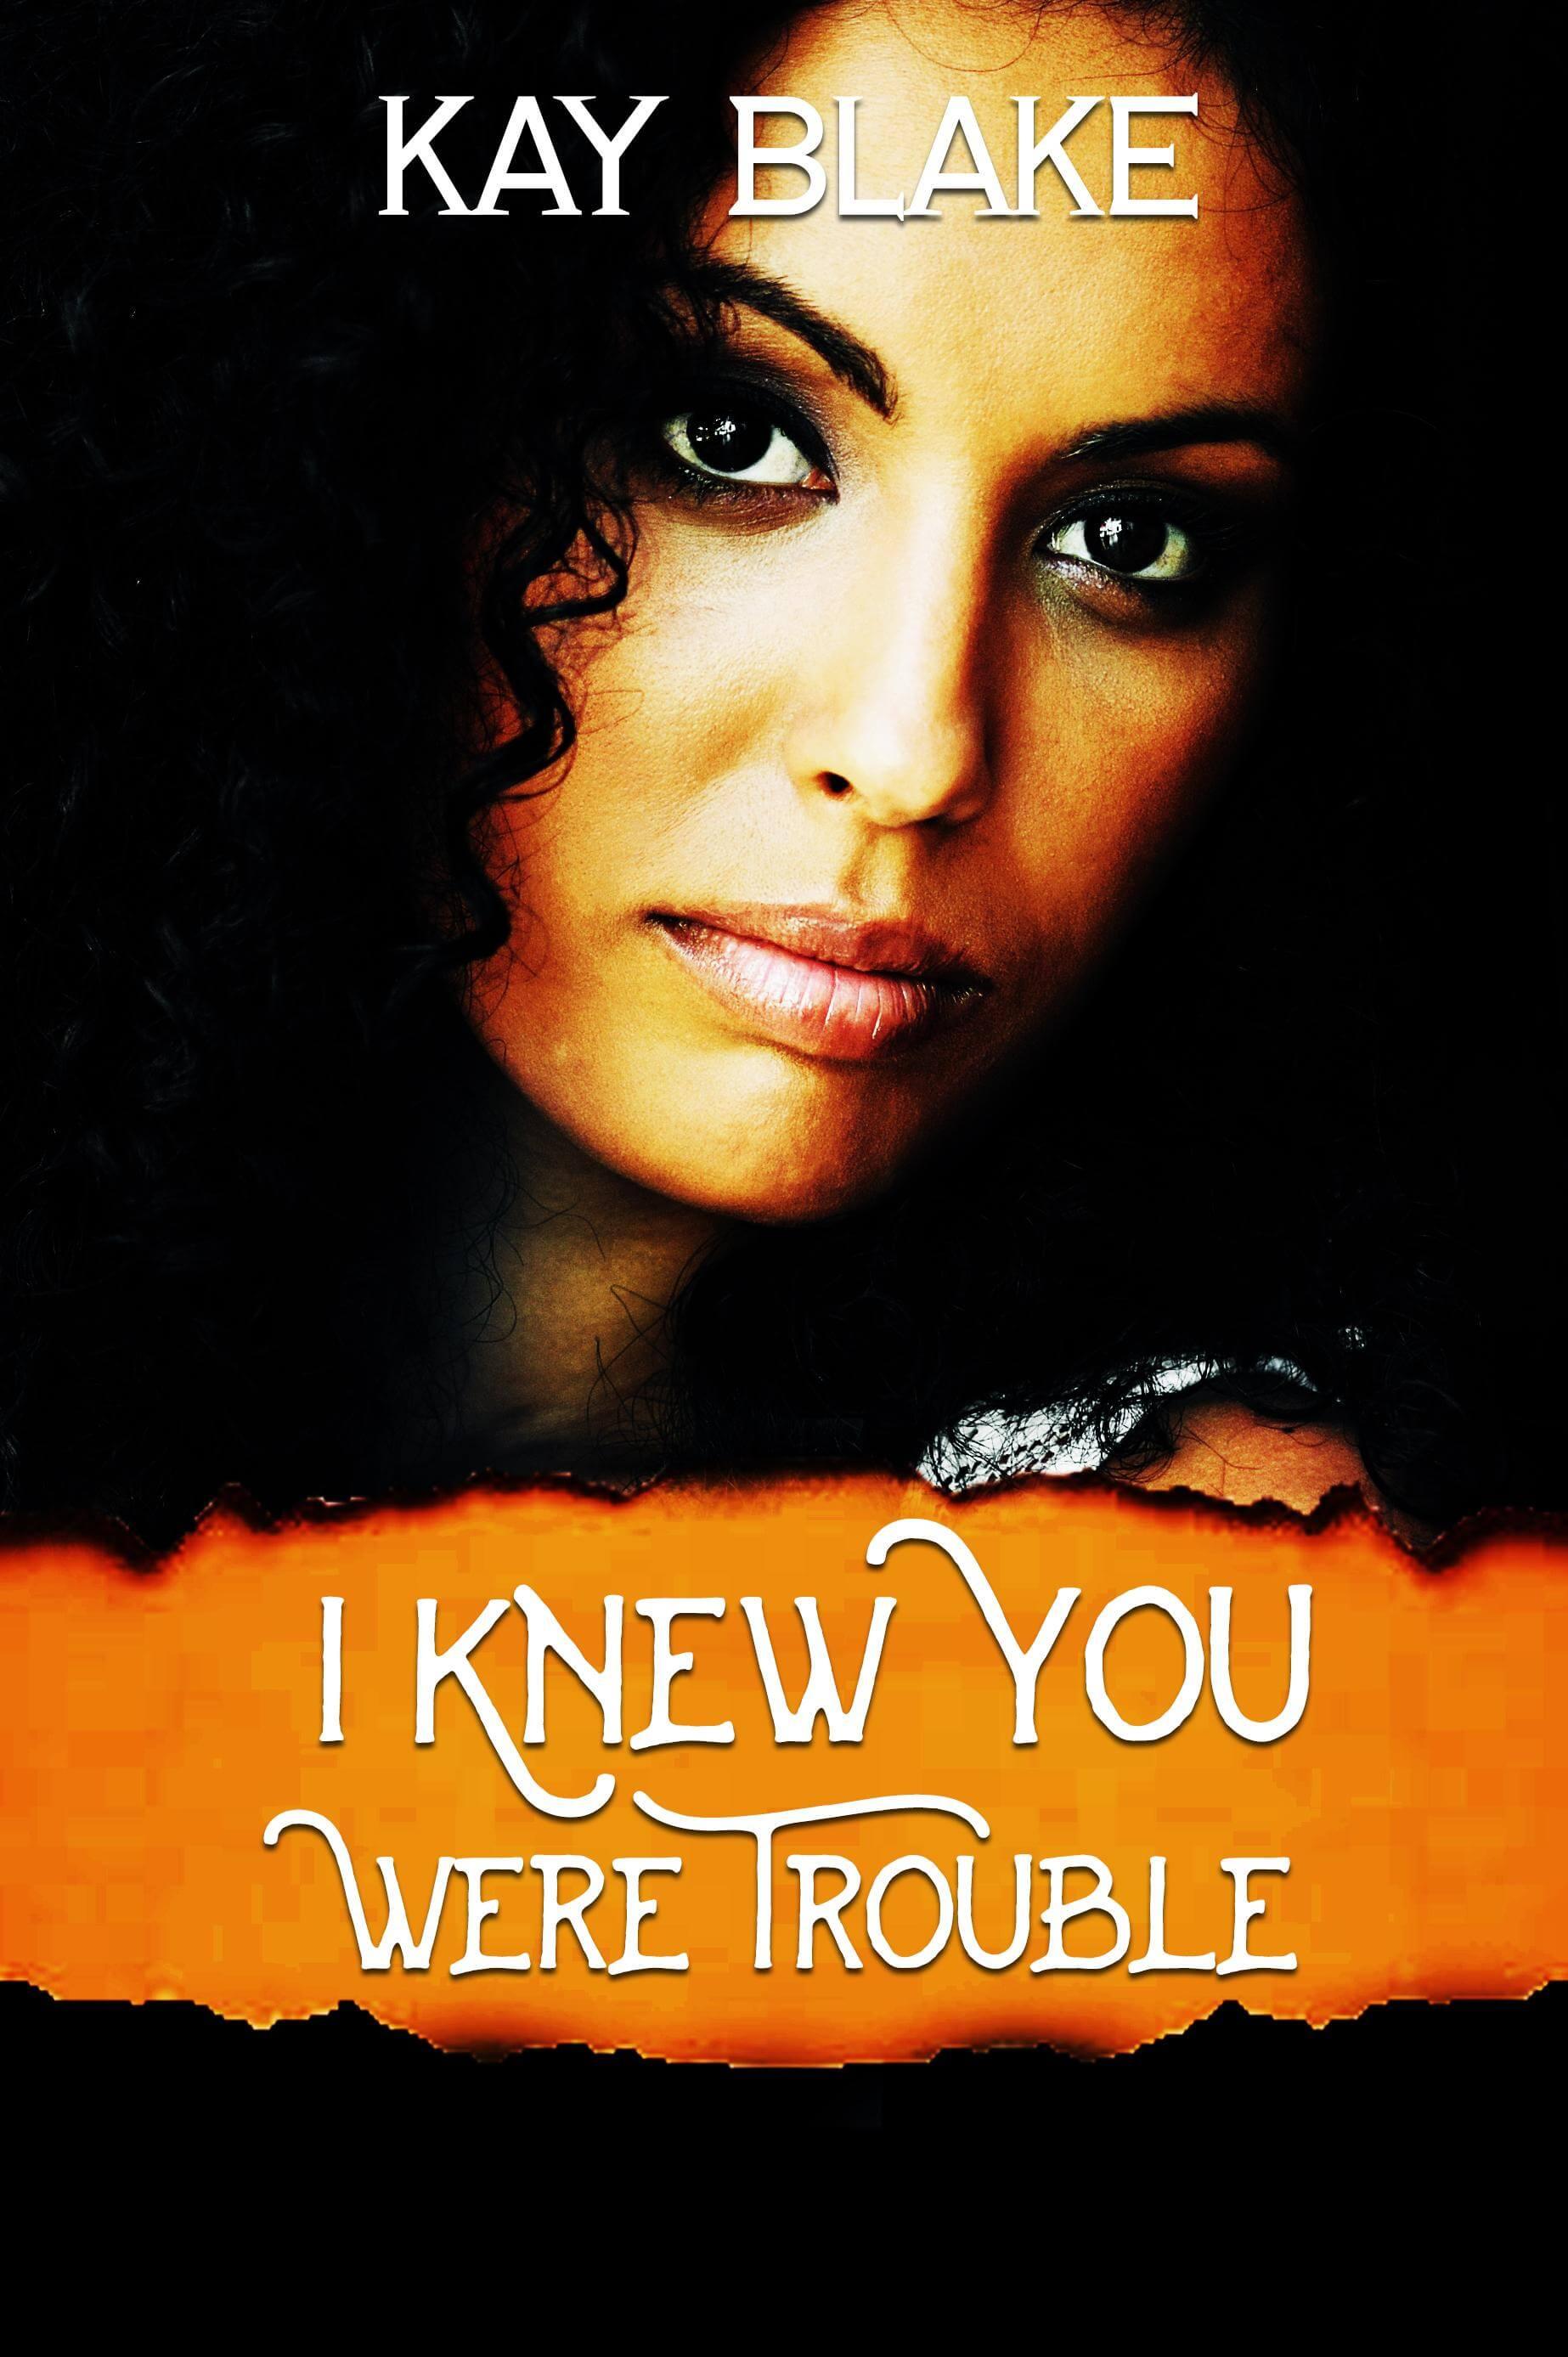 Kay Blake's I Knew You Were Trouble #kayblake #newrelease #RT #interracialromance